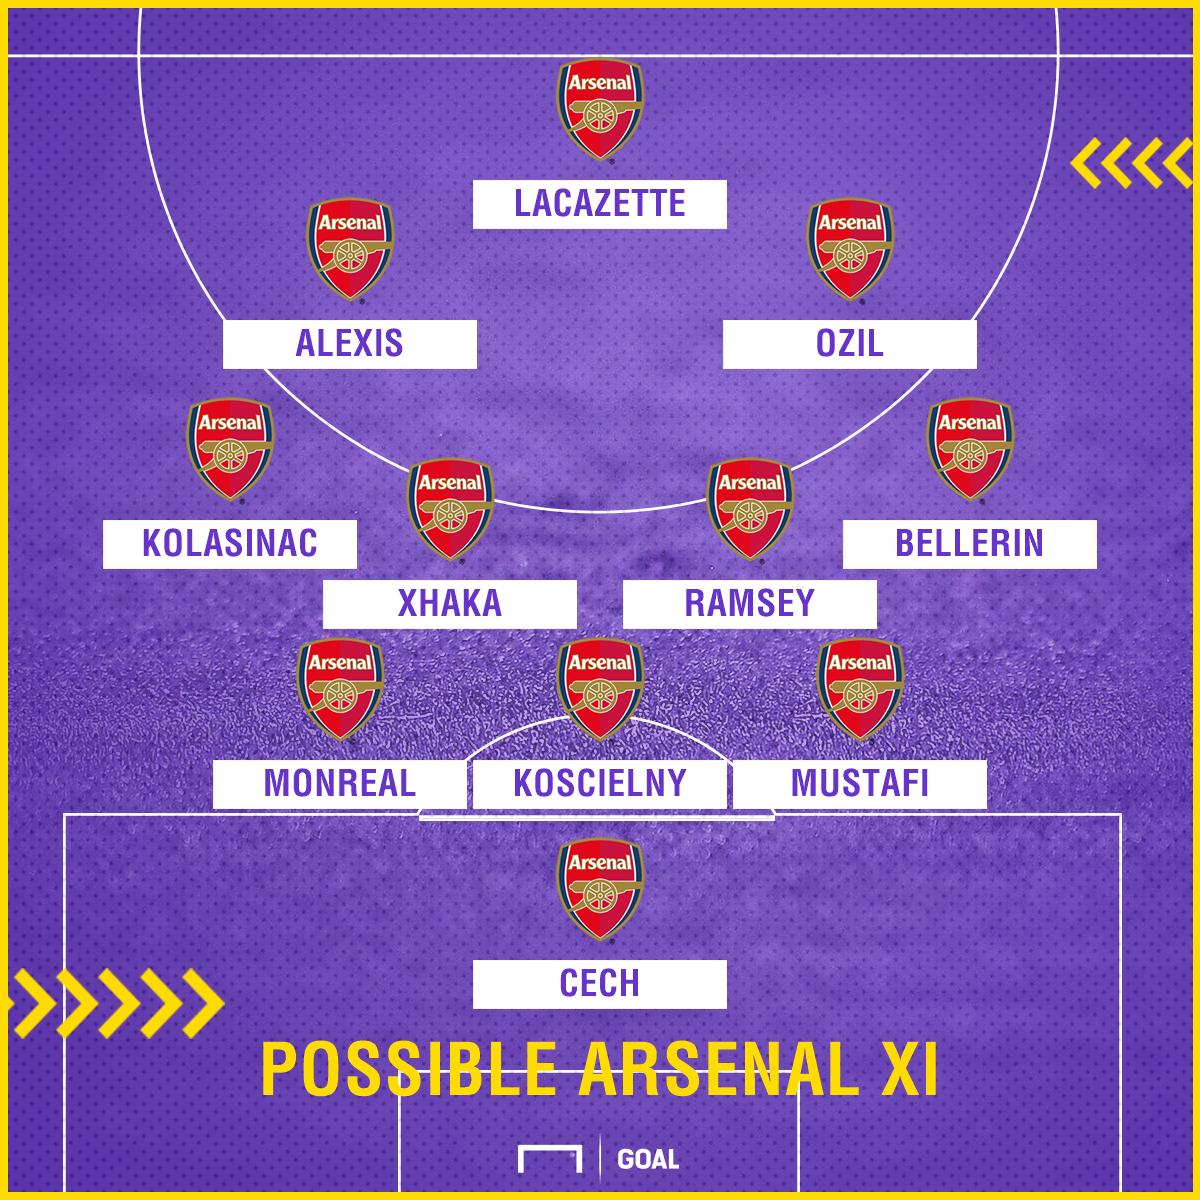 Arsenal Chelsea XI